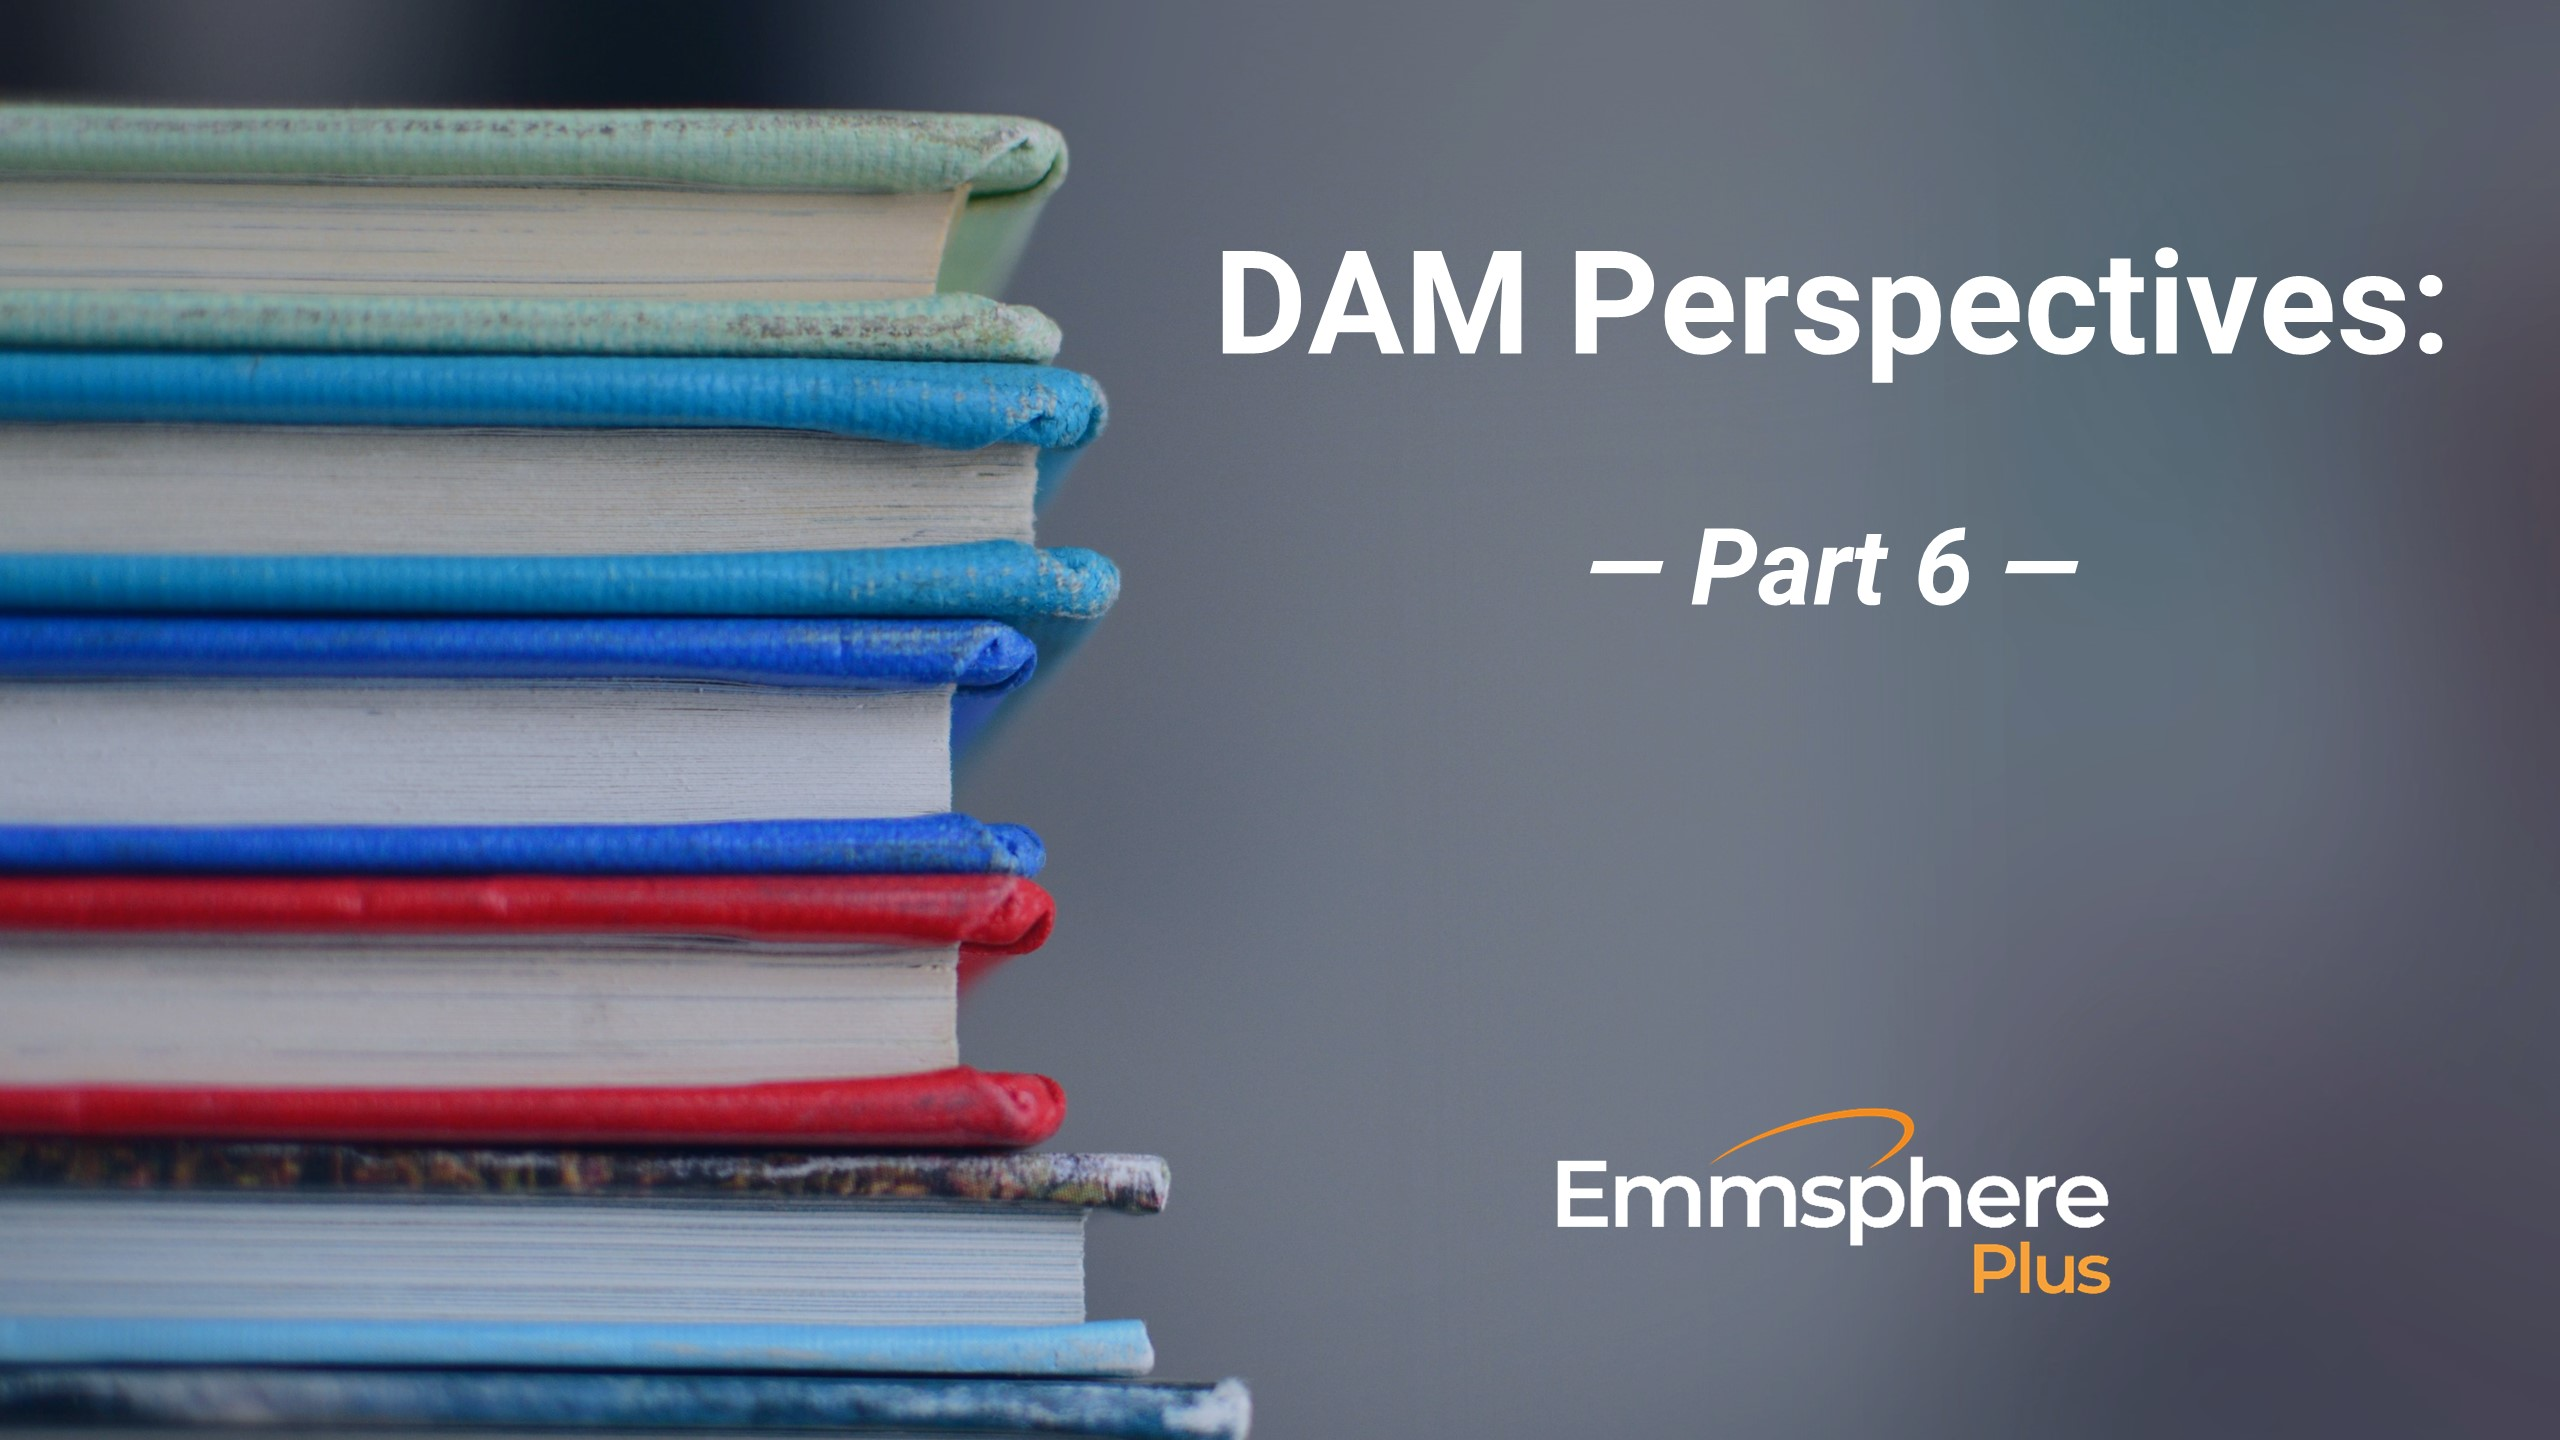 DAM Perspectives – Part 6